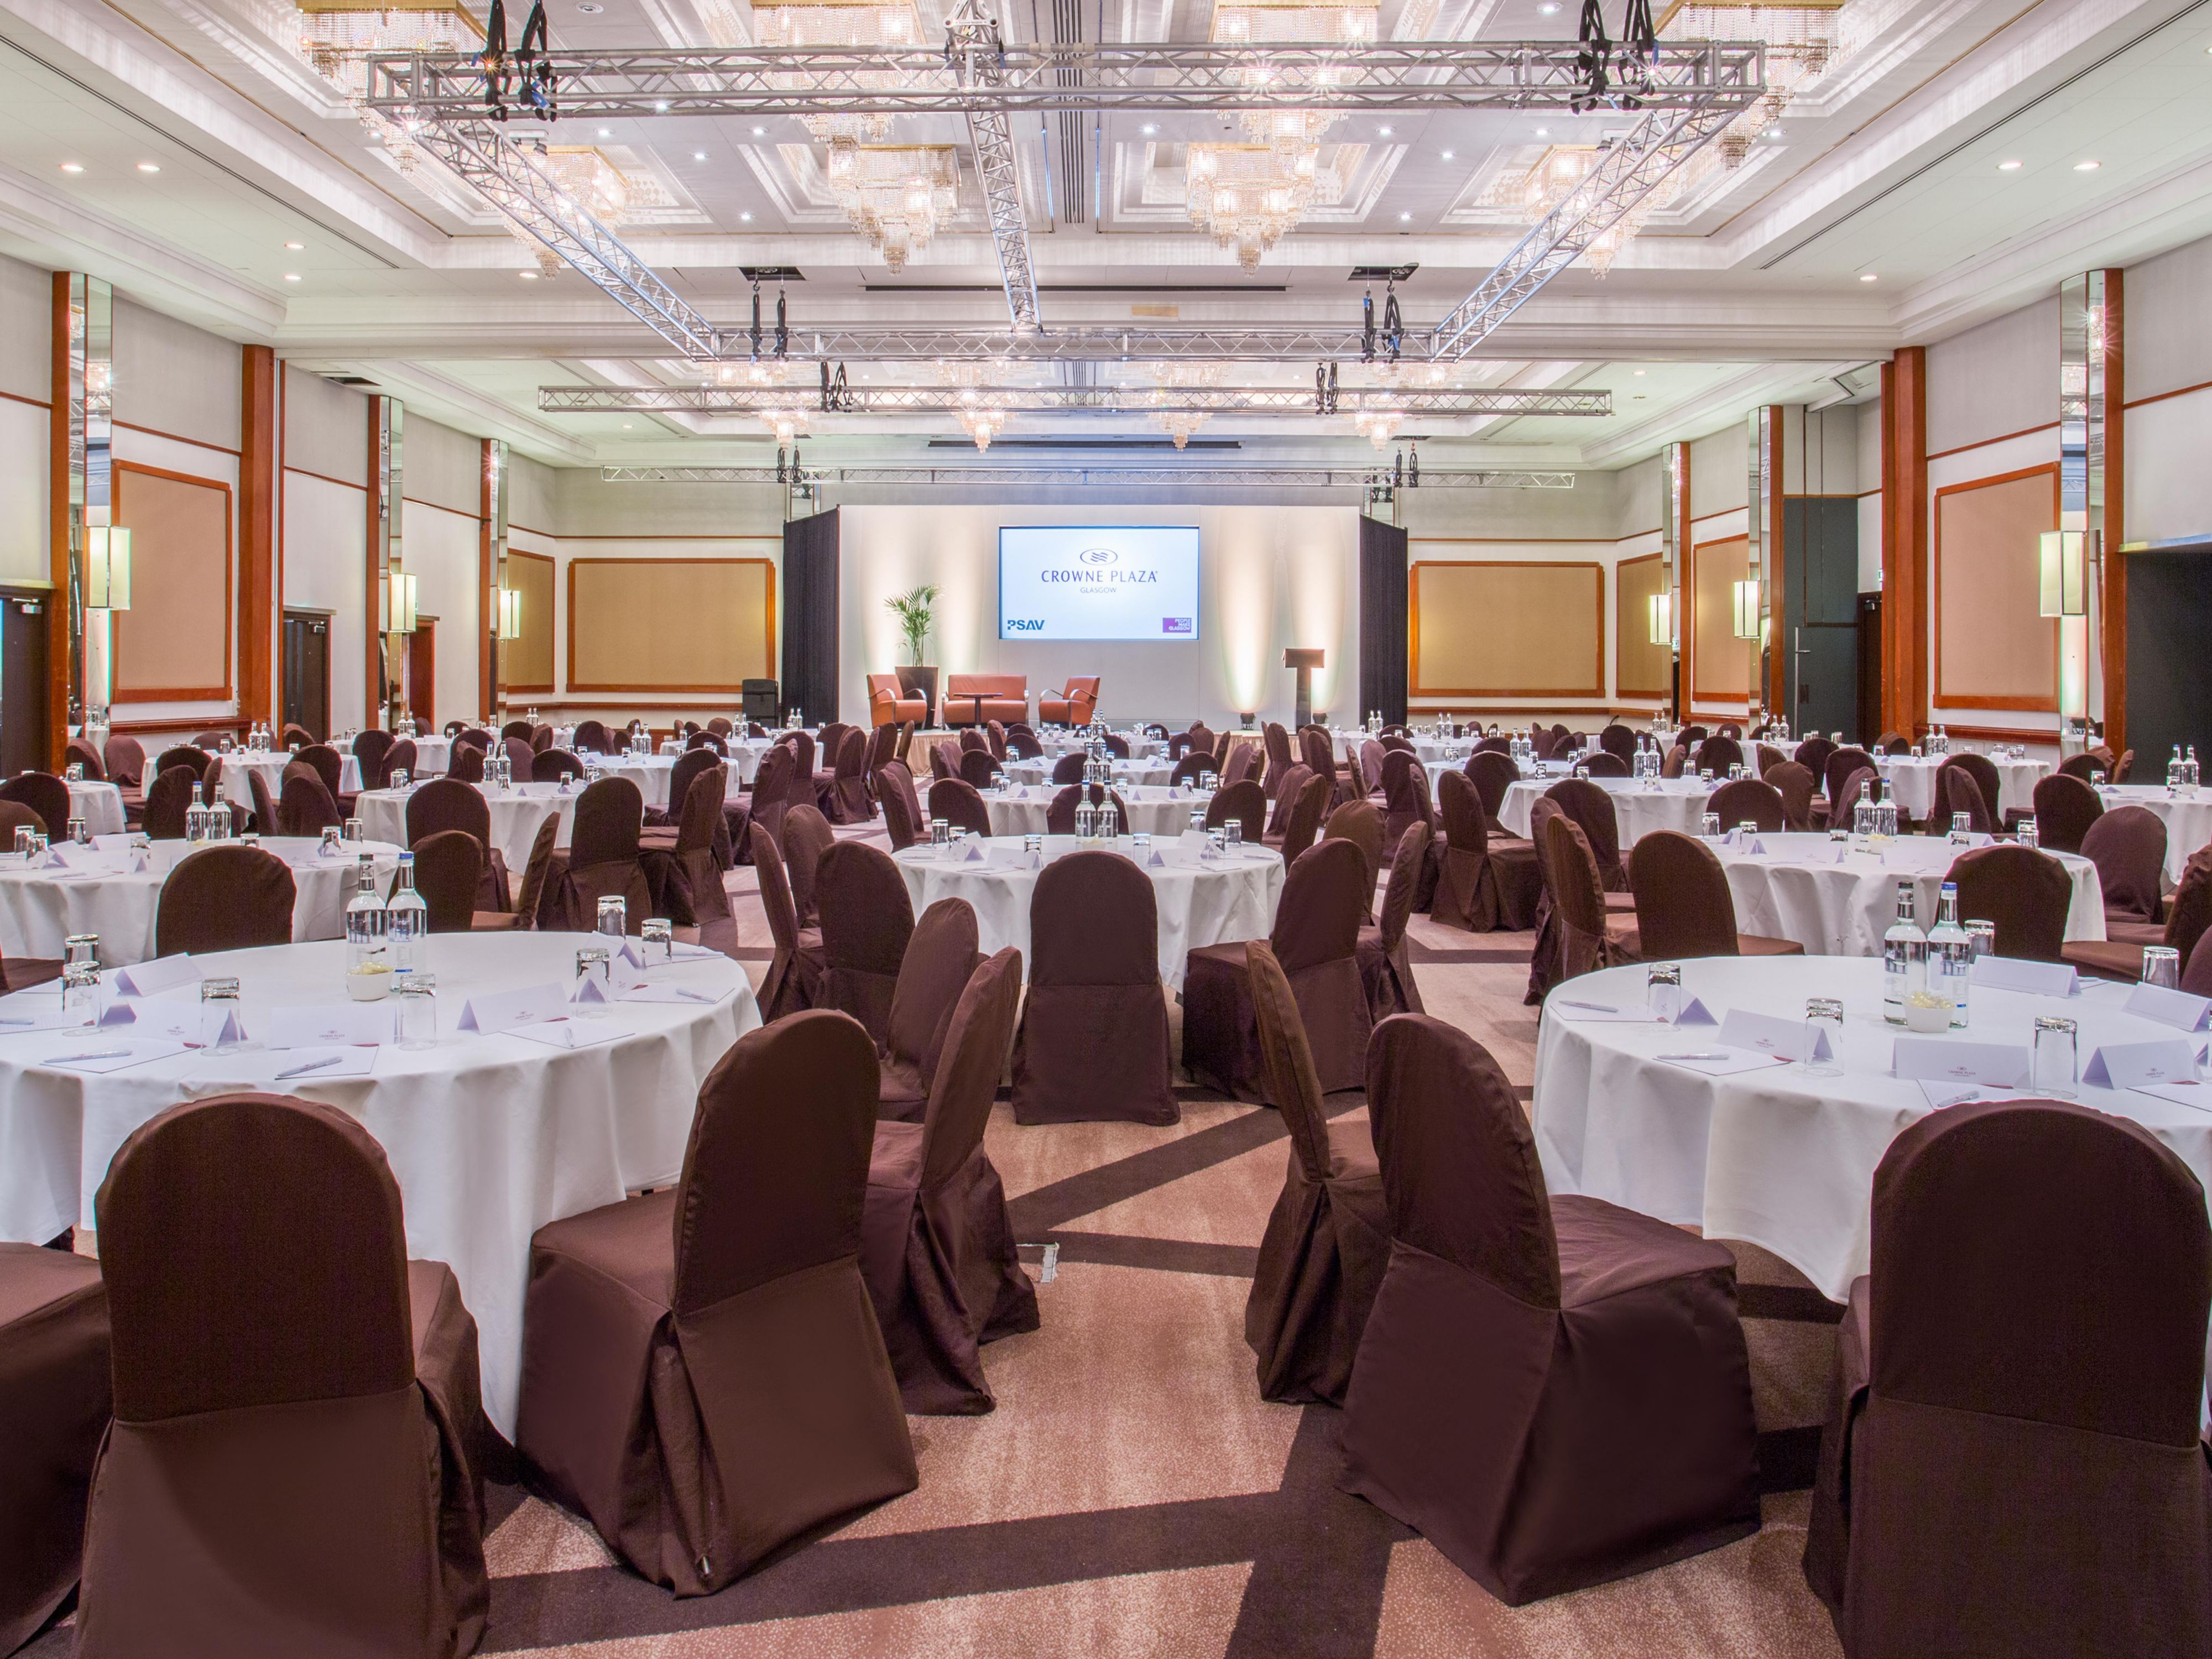 Crowne Plaza Glasgow Hotels Glasgow Events Facilities